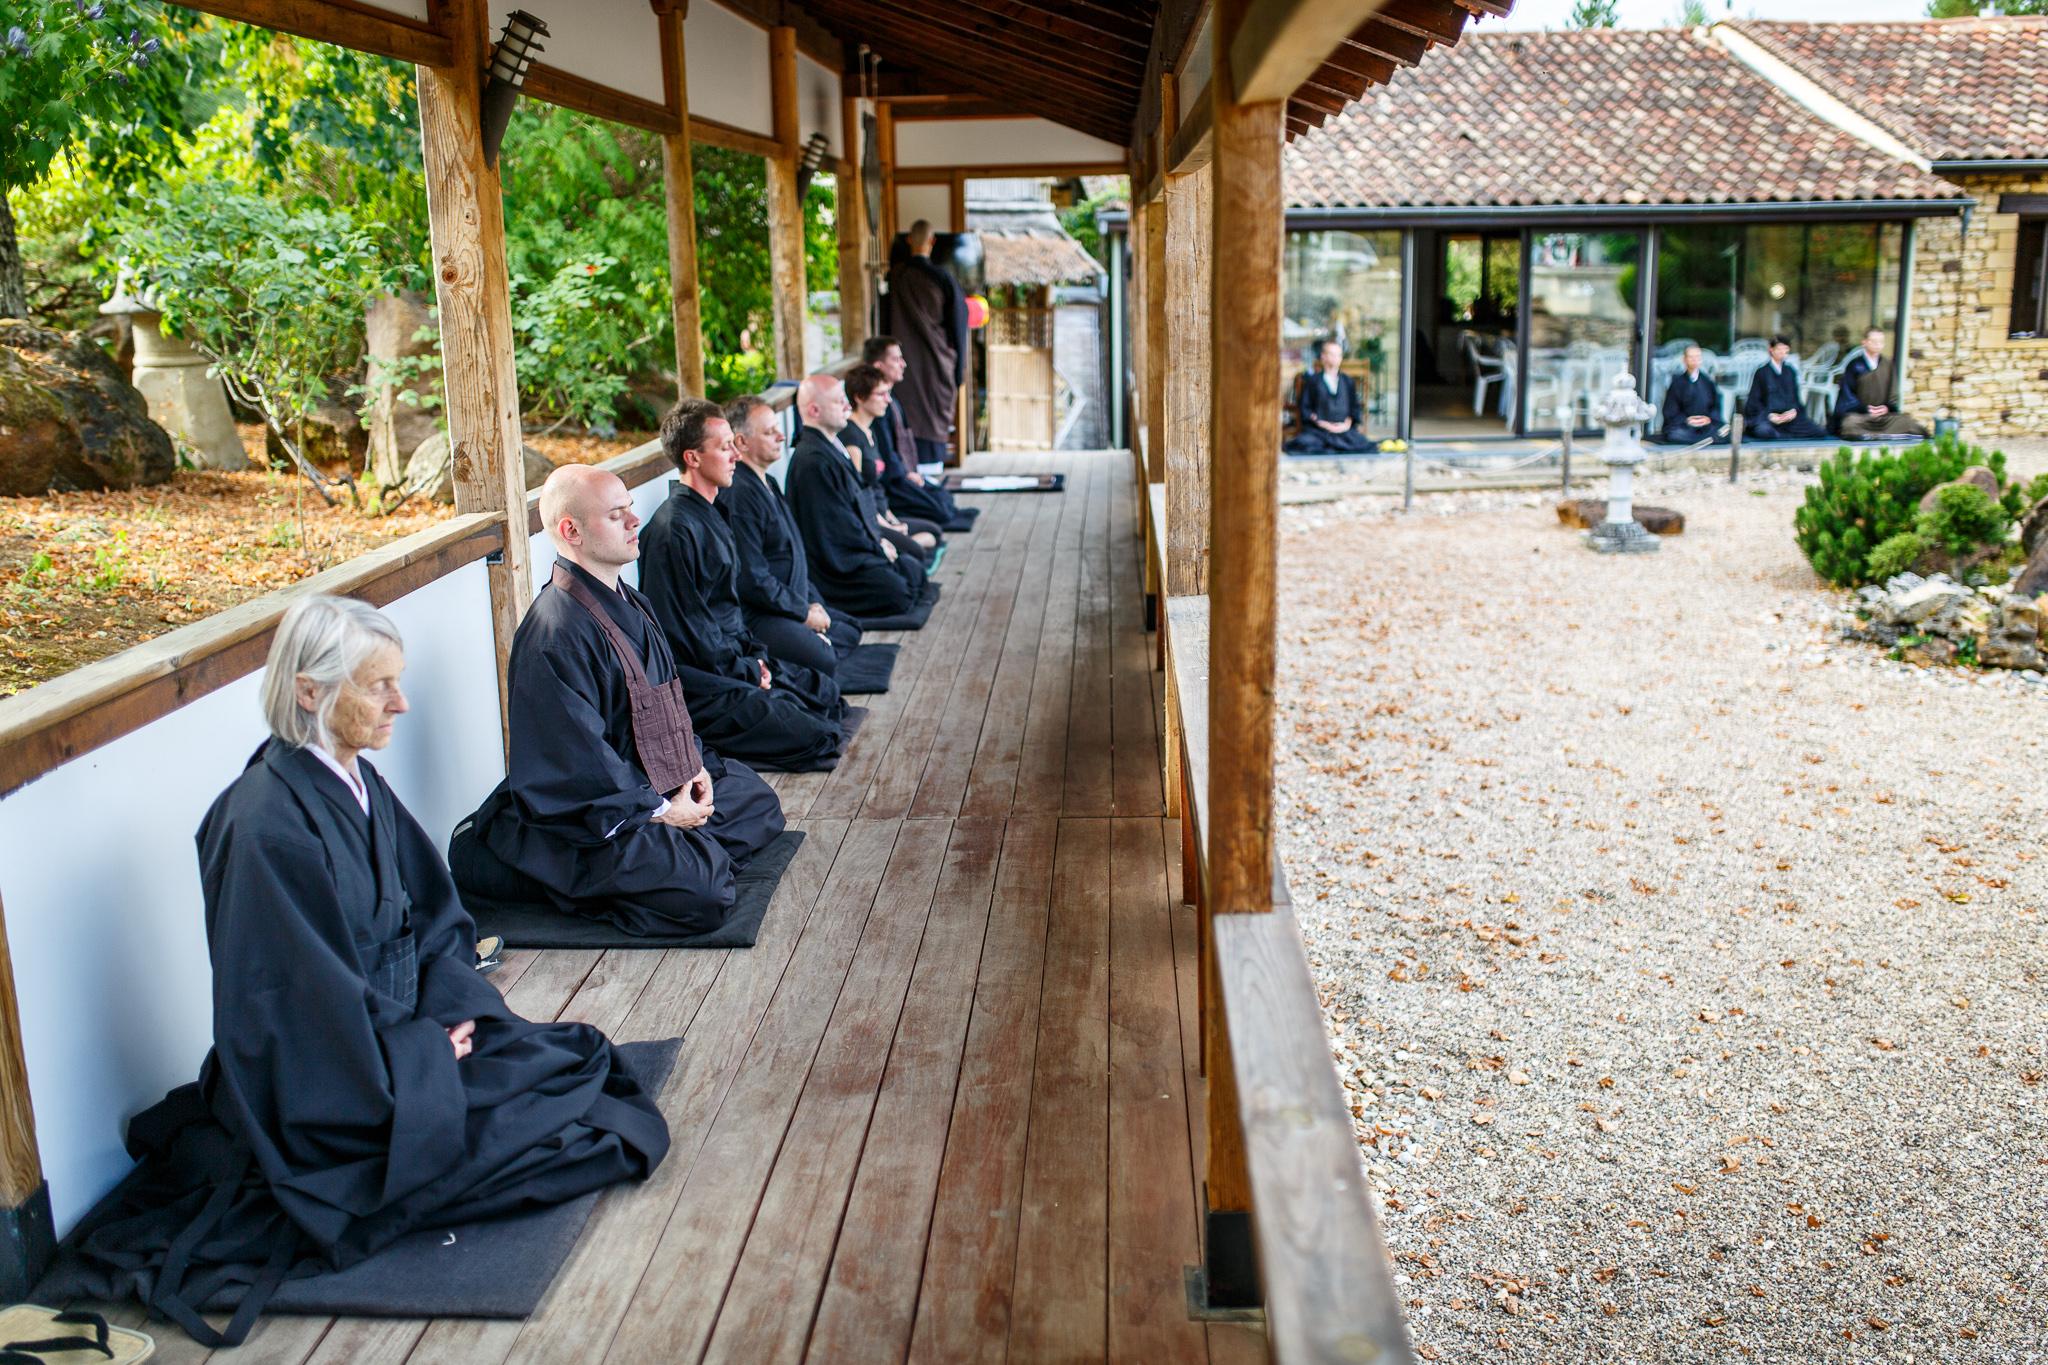 Klášter meditace